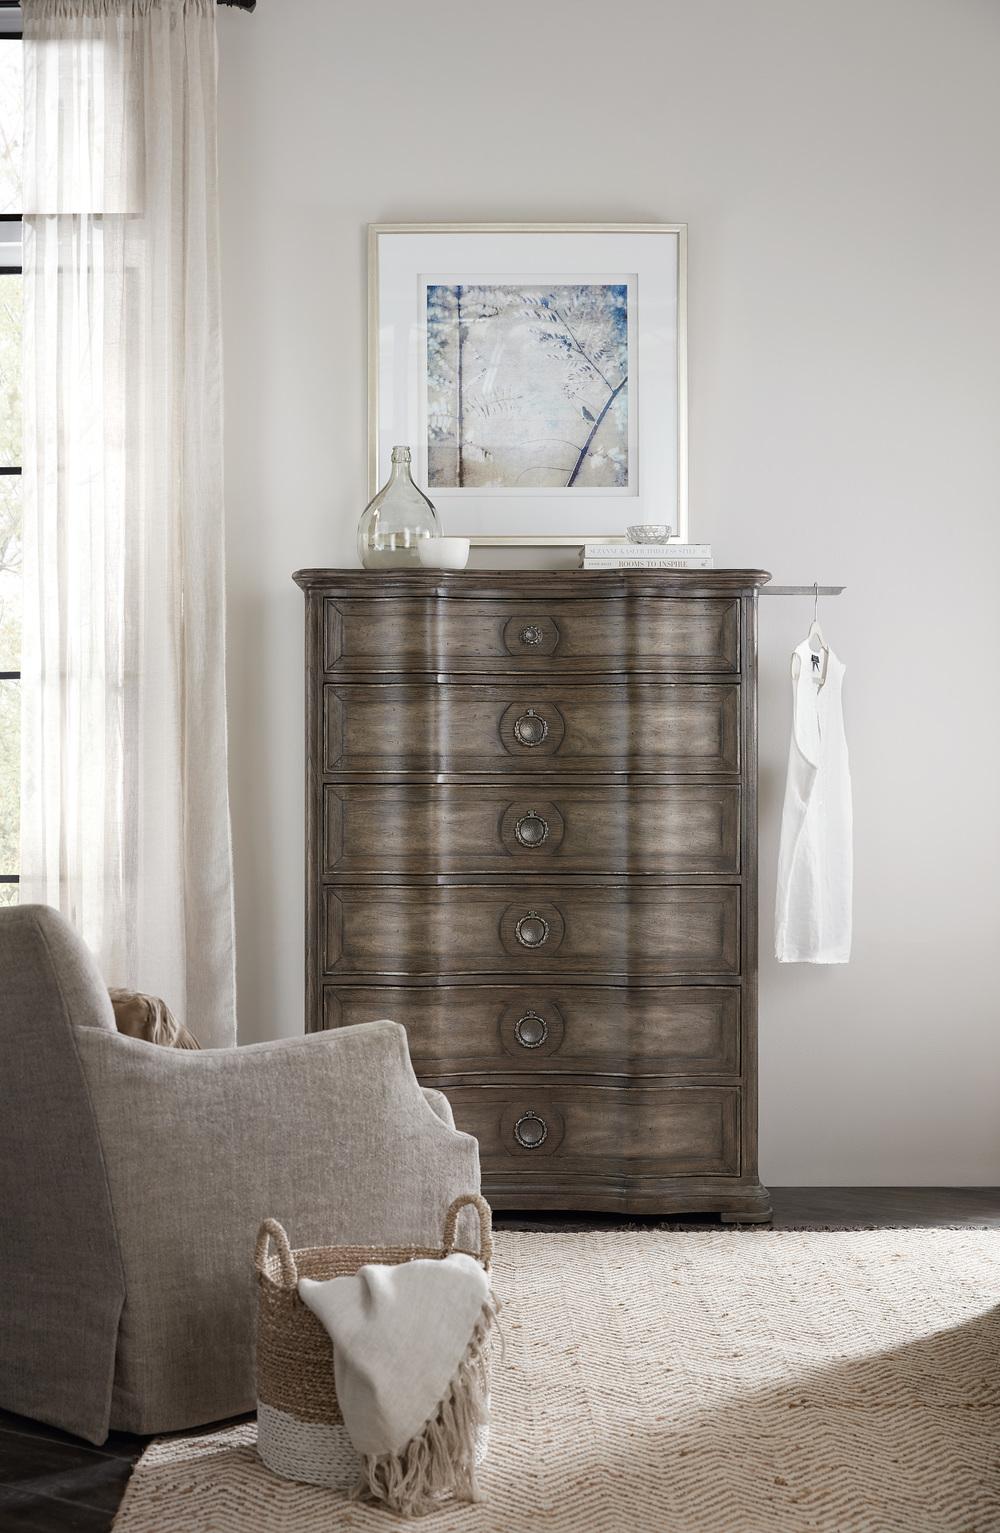 Hooker Furniture - Six Drawer Chest